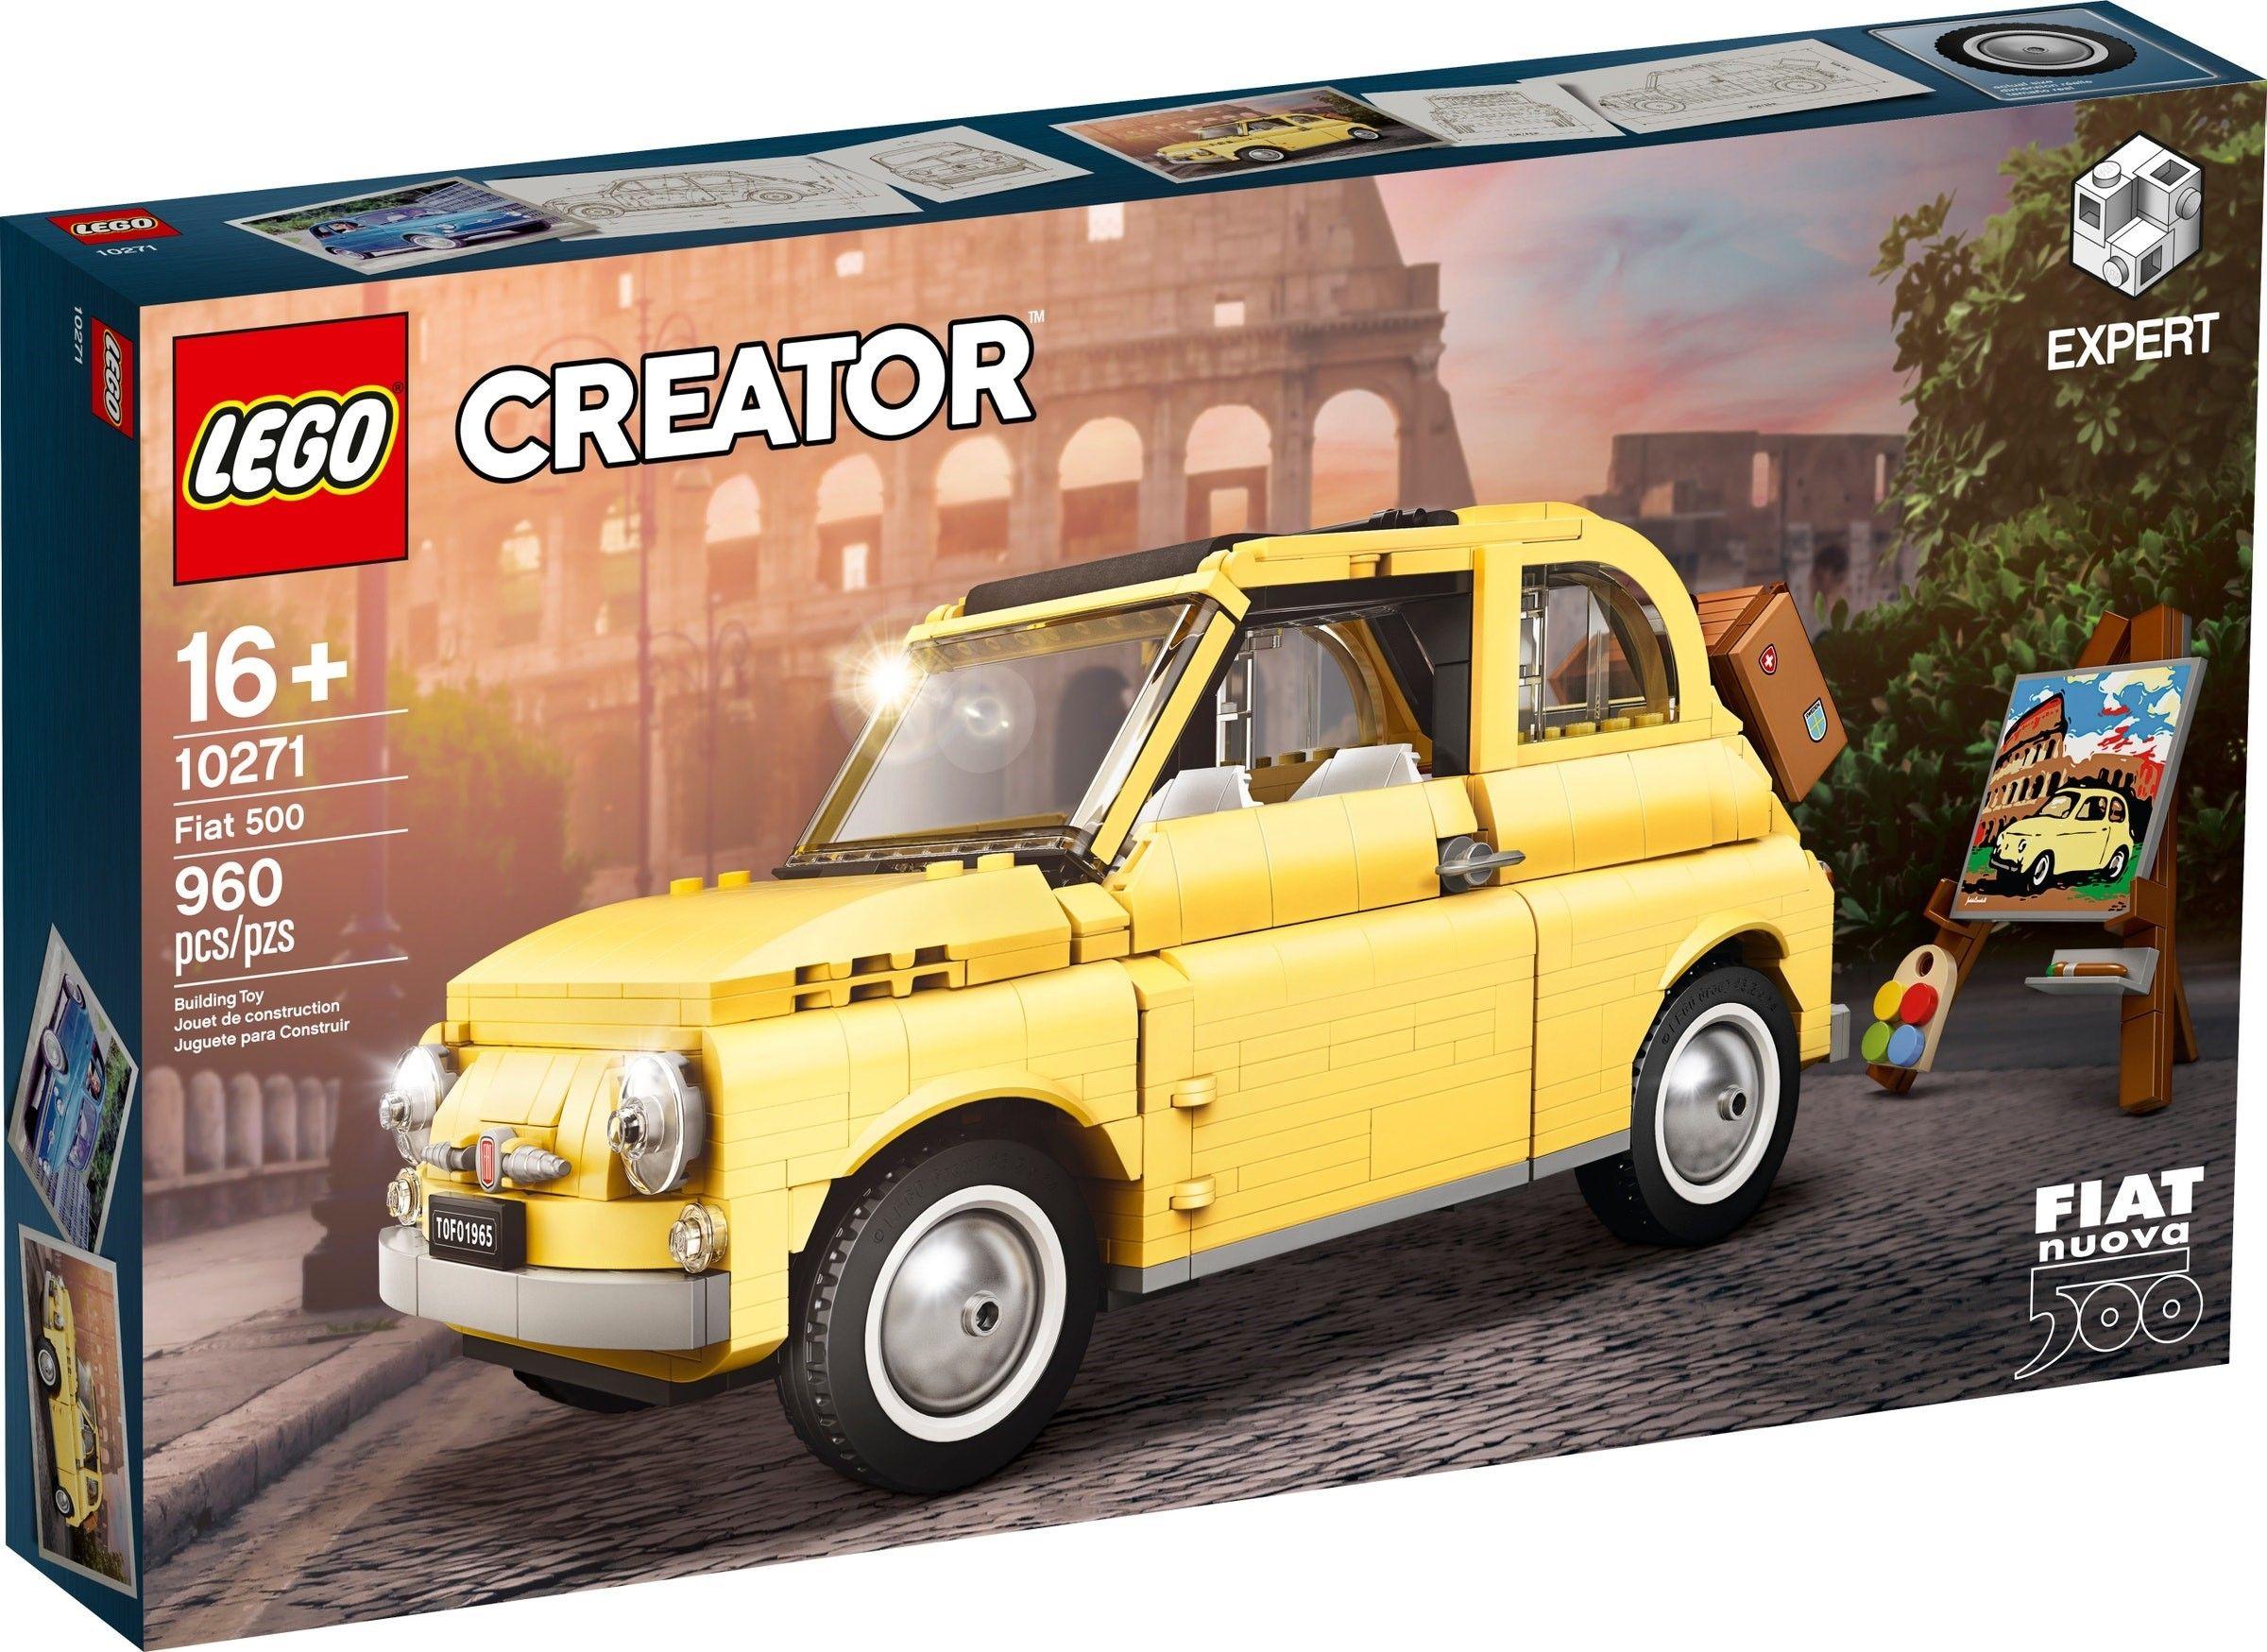 Lego 10271 1 Fiat 500 Fiat 500 Fiat Lego Creator